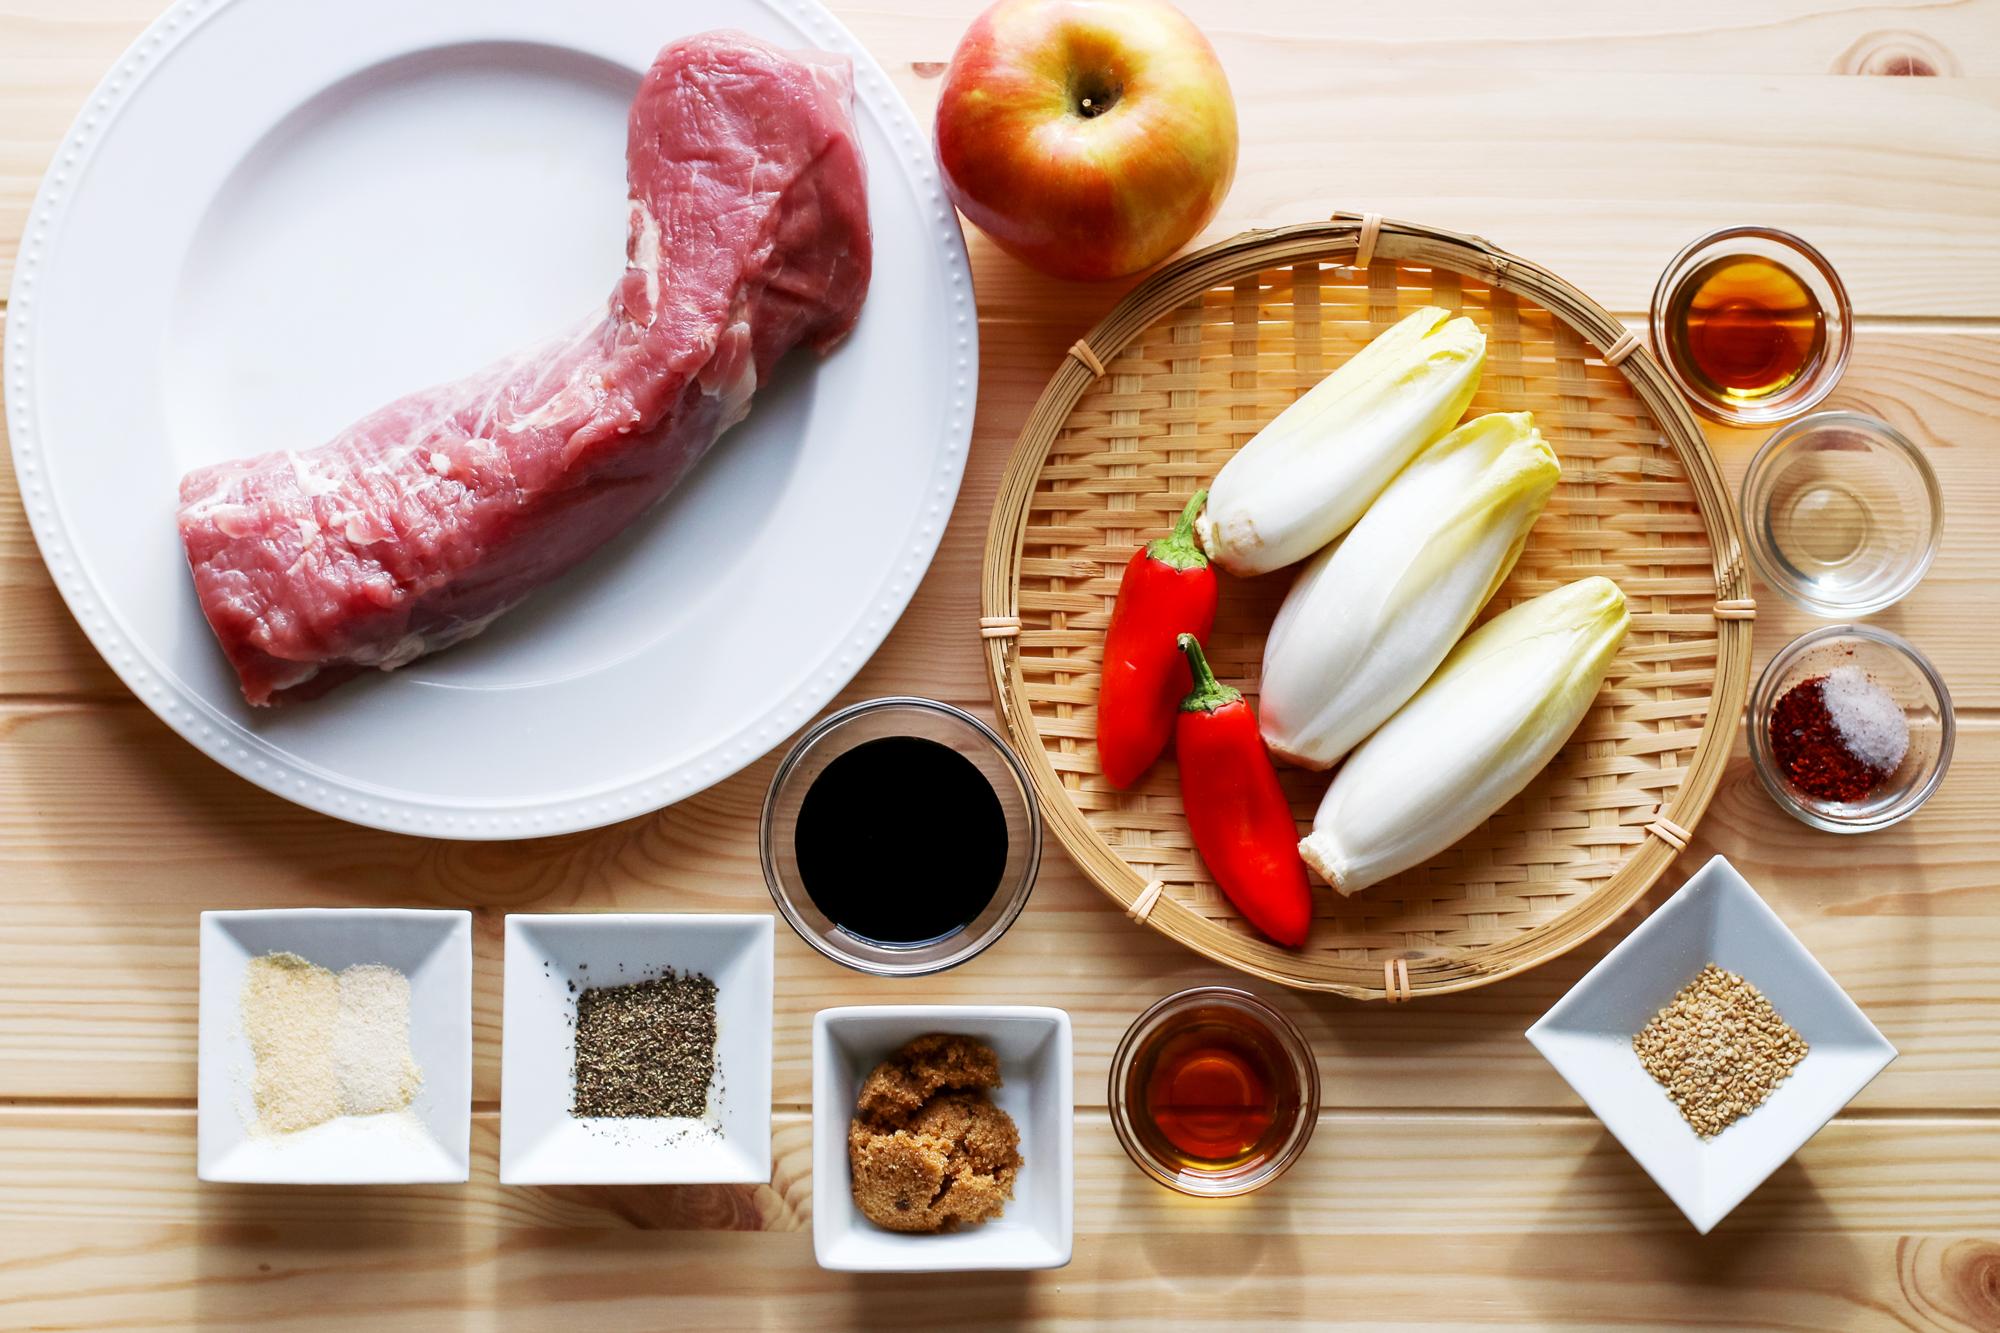 The ingredients: pork tenderloin, endives, Fuji apple, small red chili, sesame seeds. For the marinade, soy sauce, sesame oil, brown sugar, black pepper, garlic granules, onion granules. For the salad dressing, sesame oil, rice wine vinegar, gochugaru (Korean red pepper flakes) and salt.